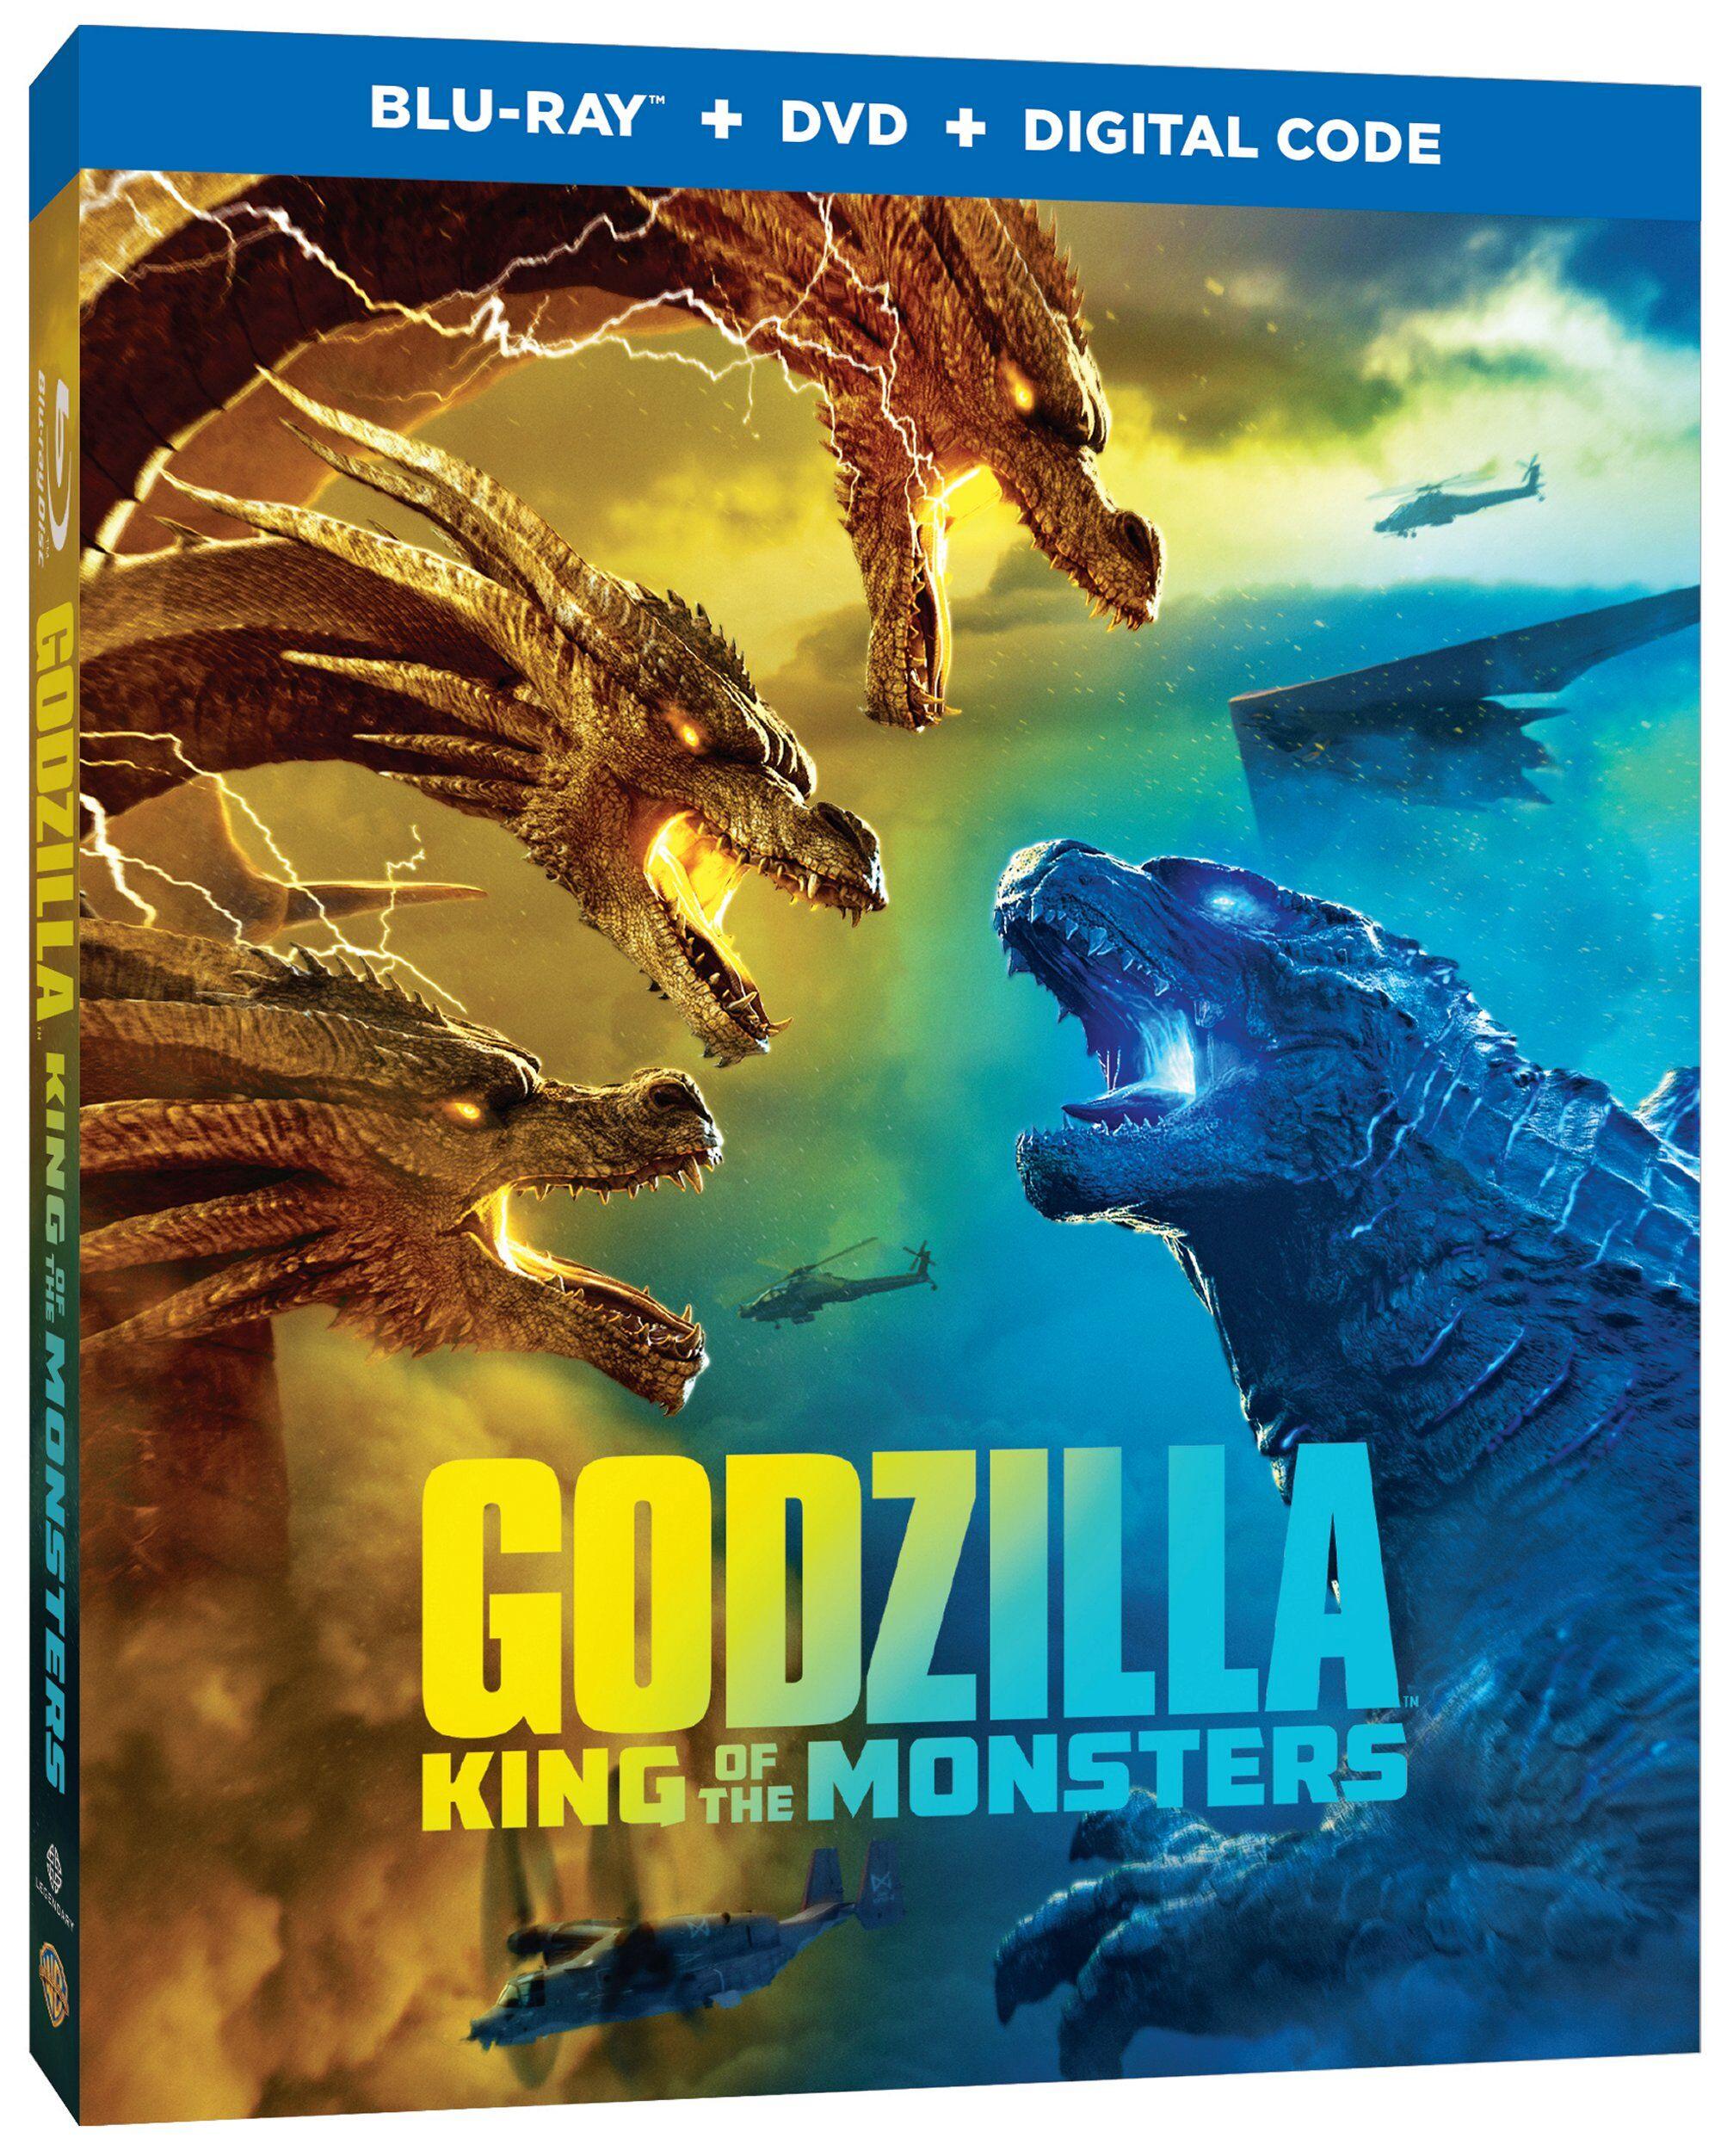 Godzilla King of Monsters Blu-ray Review